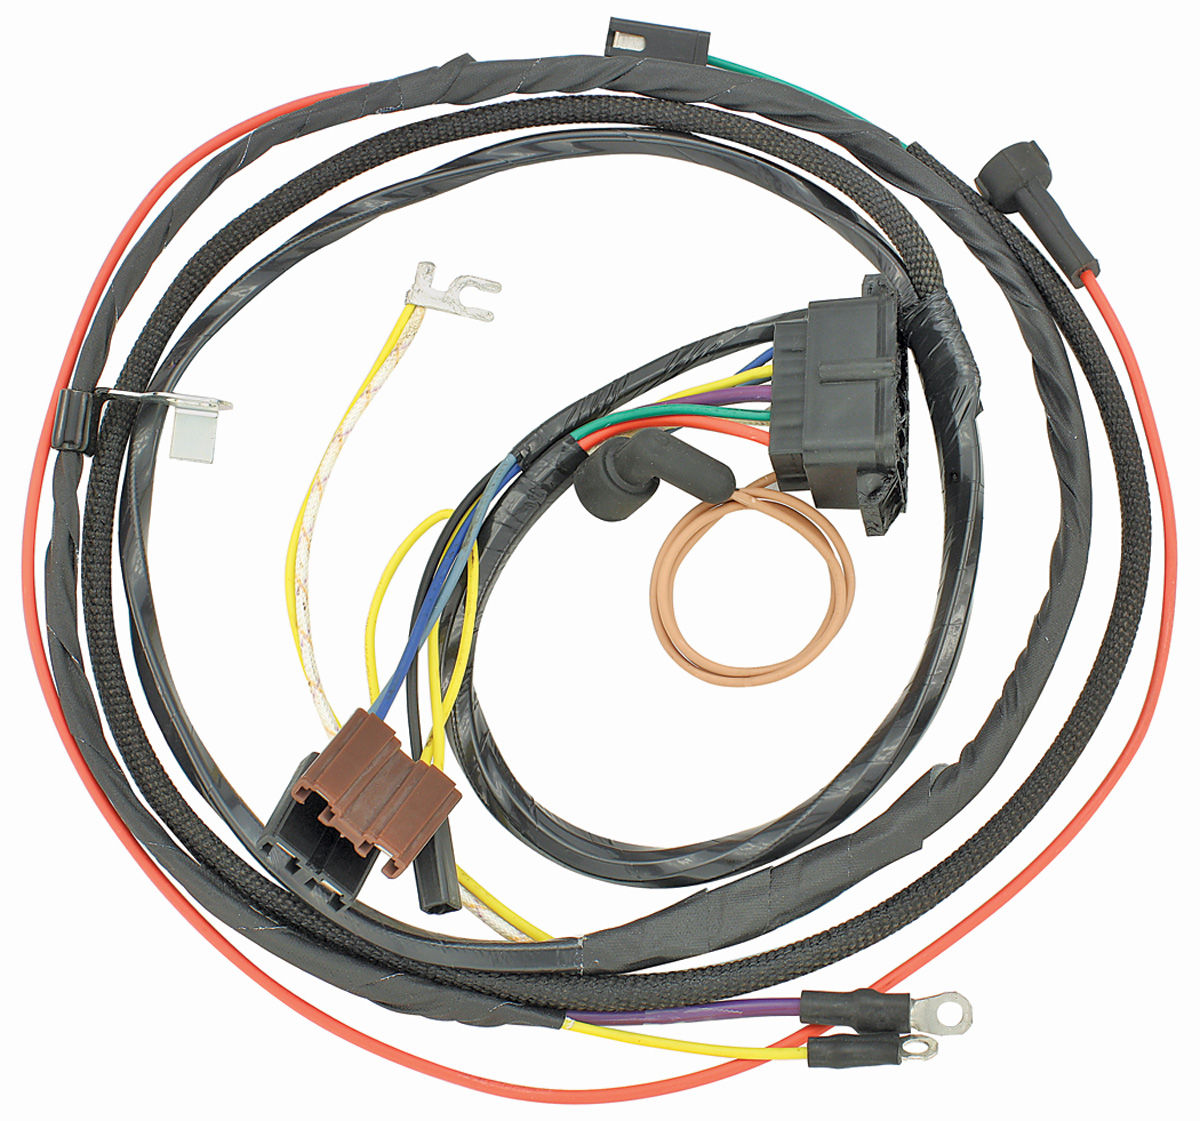 medium resolution of 1967 chevelle wiring harness wiring diagram online 1969 chevelle wiring harness 1967 chevelle wiring harness